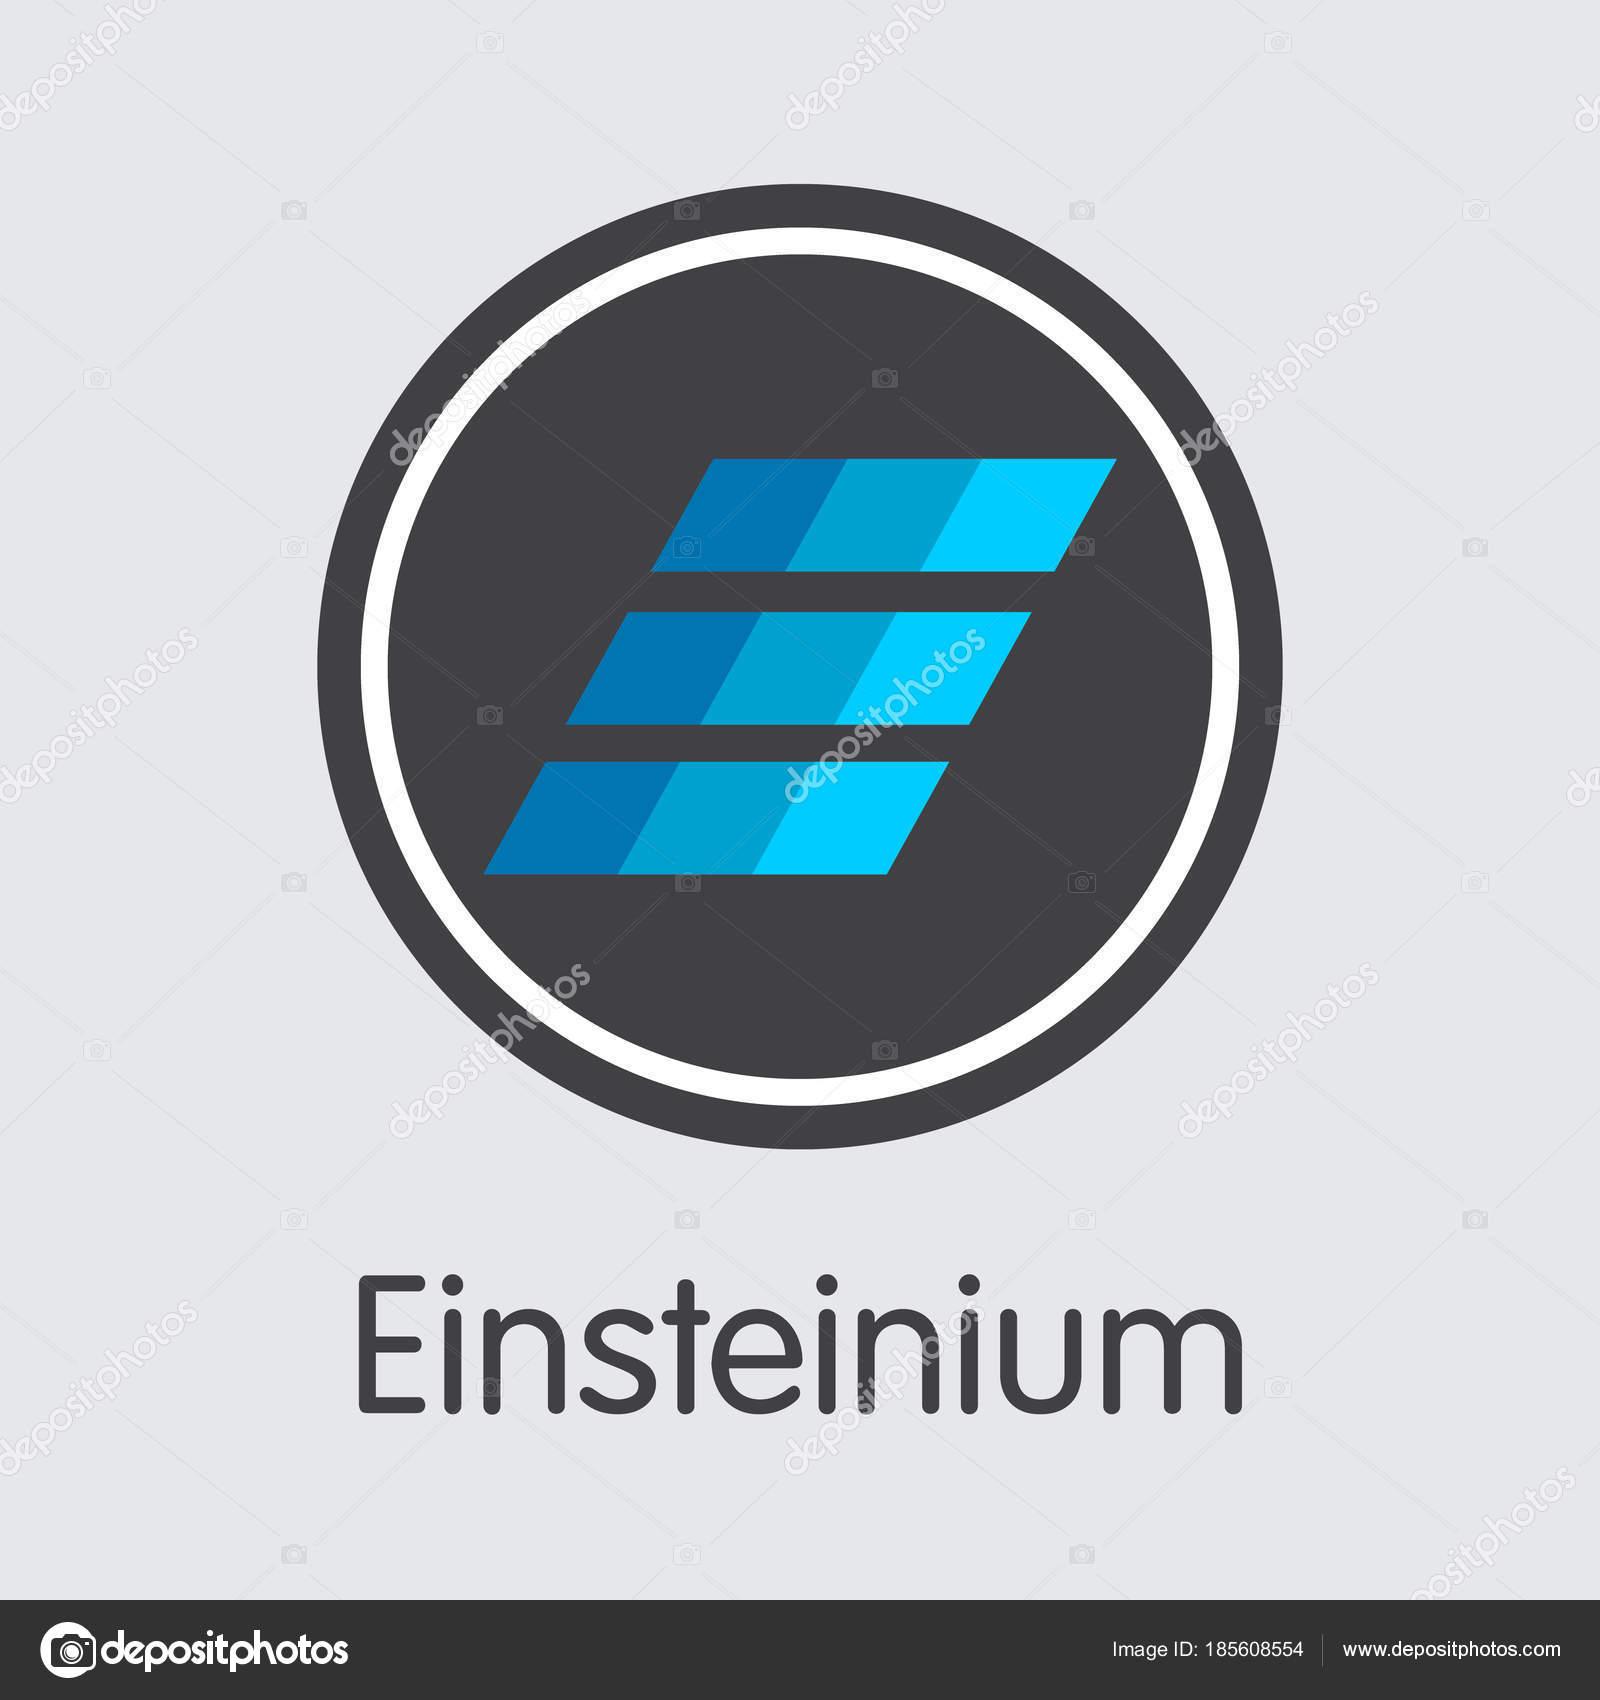 Einsteinium Crypto Currency Vector Emc2 Graphic Symbol Stock